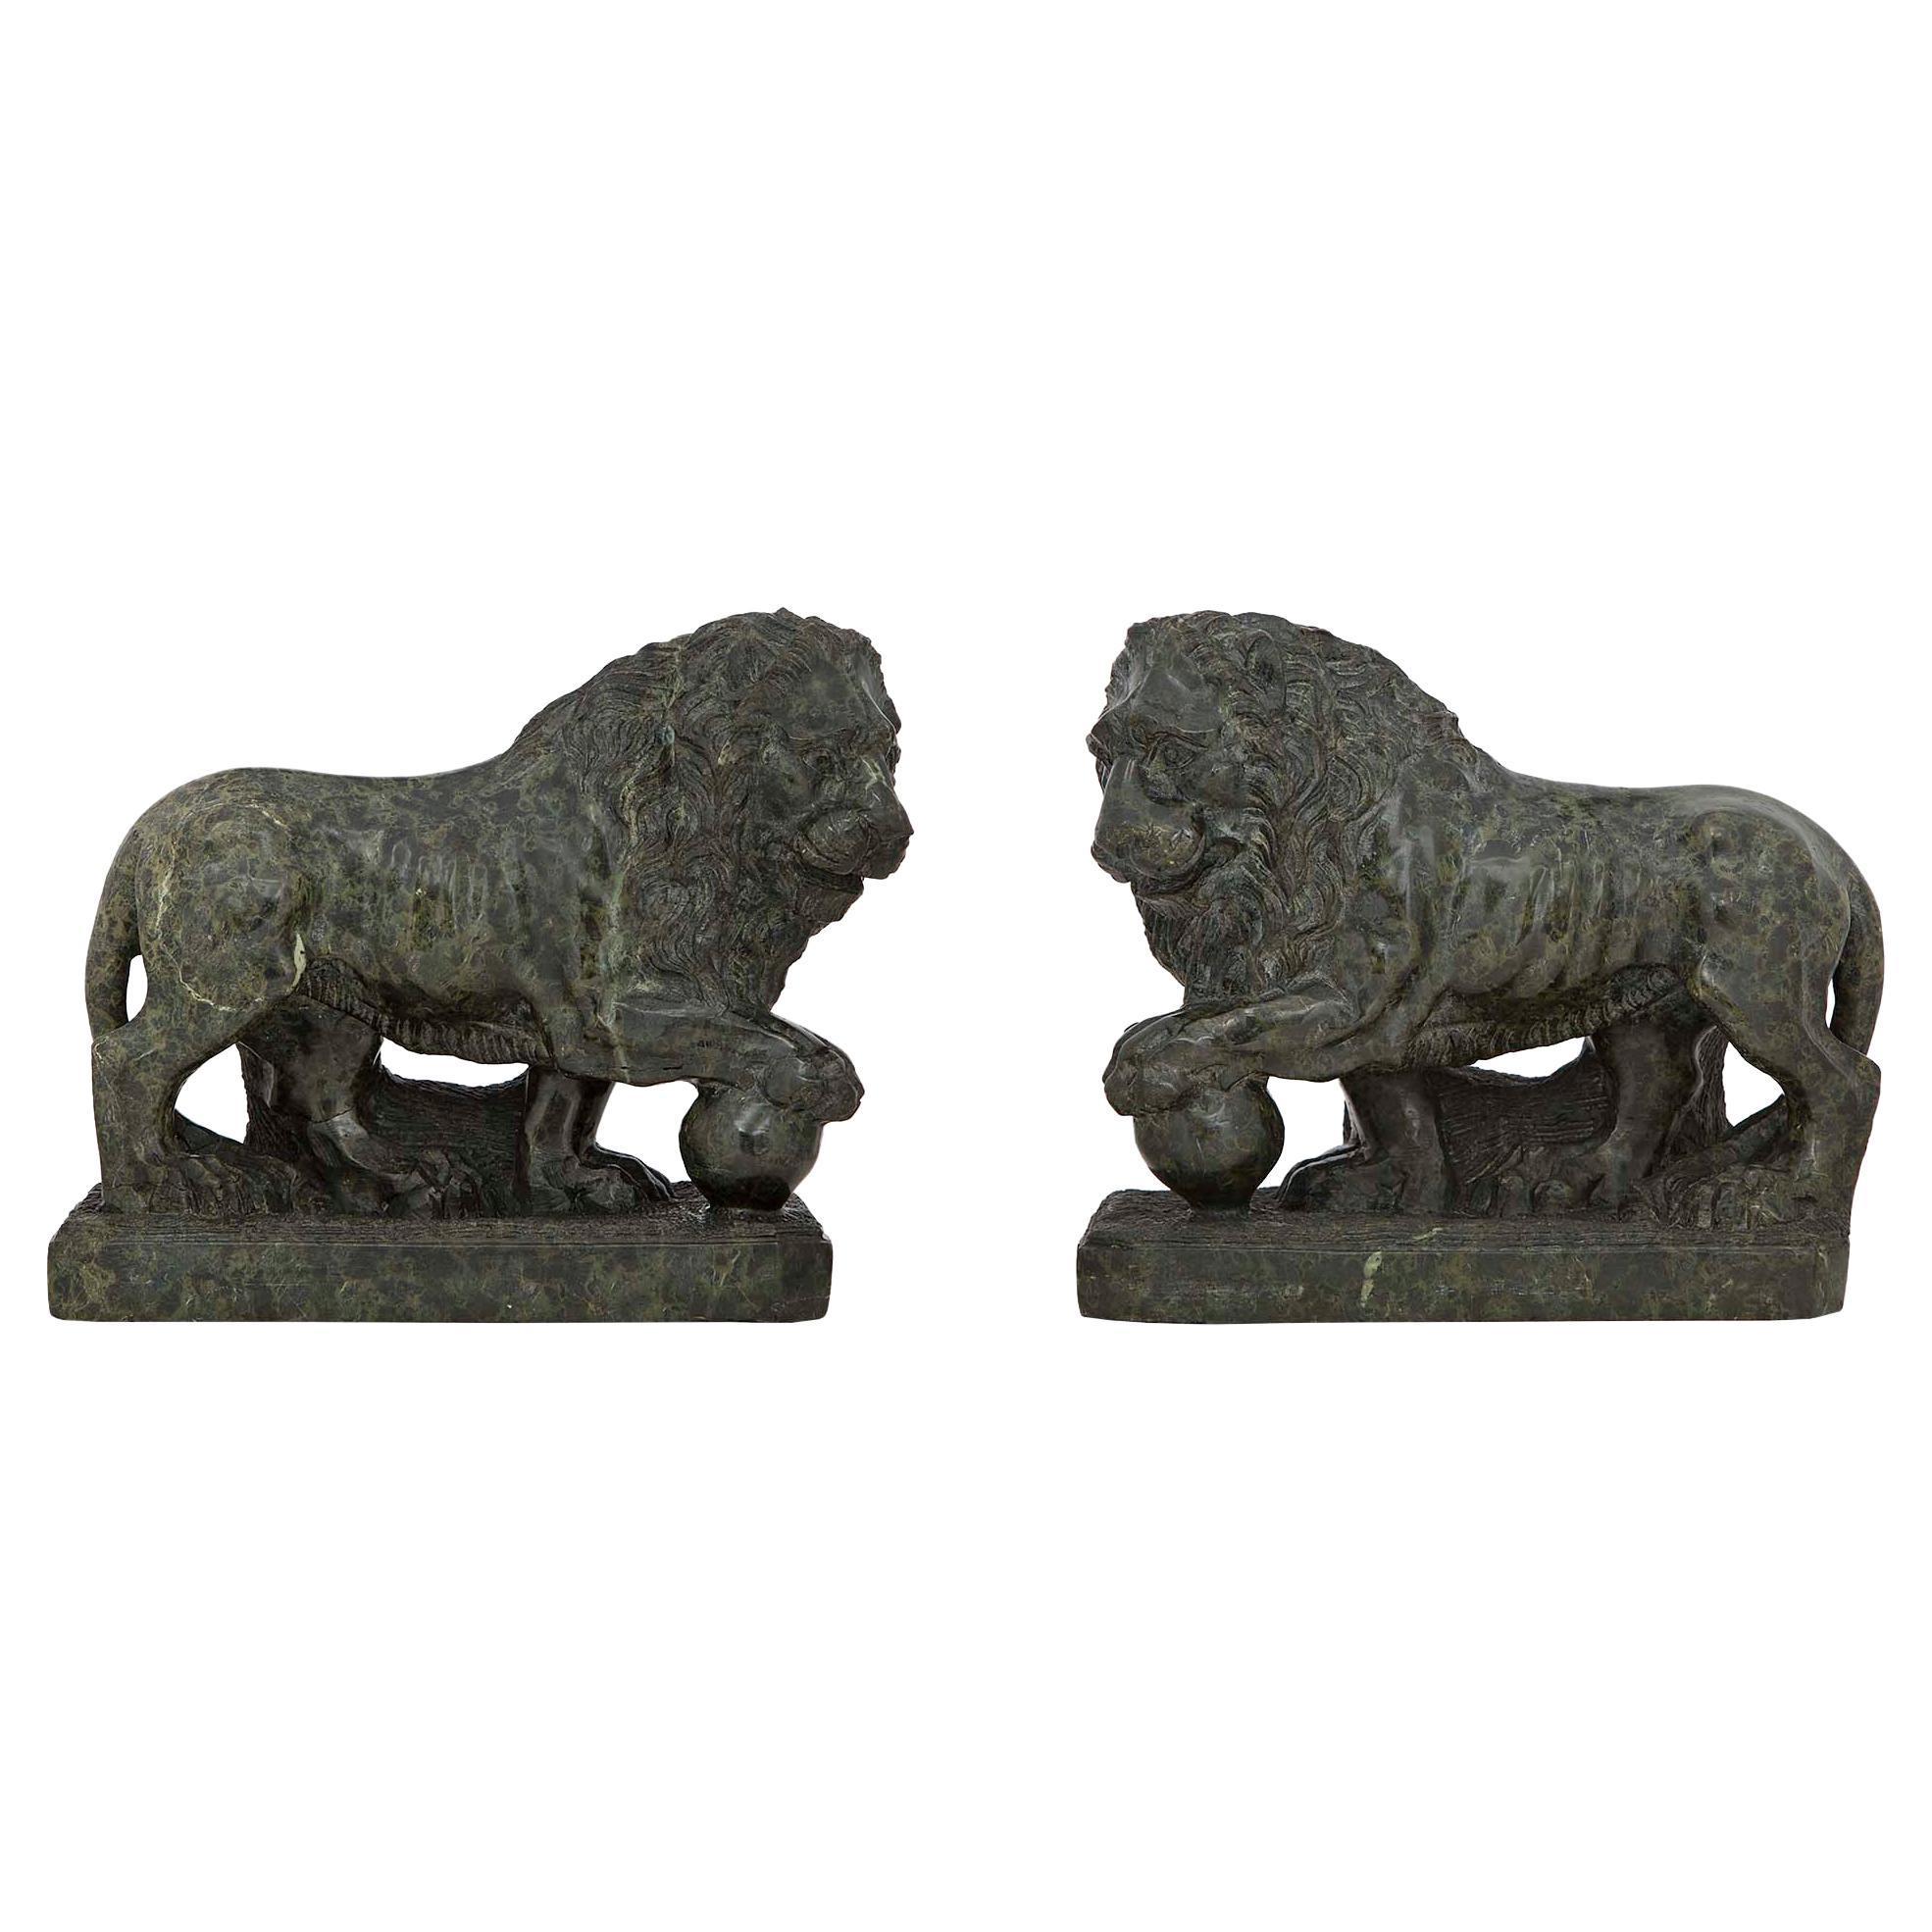 Pair of Italian 19th Century Marble Statues